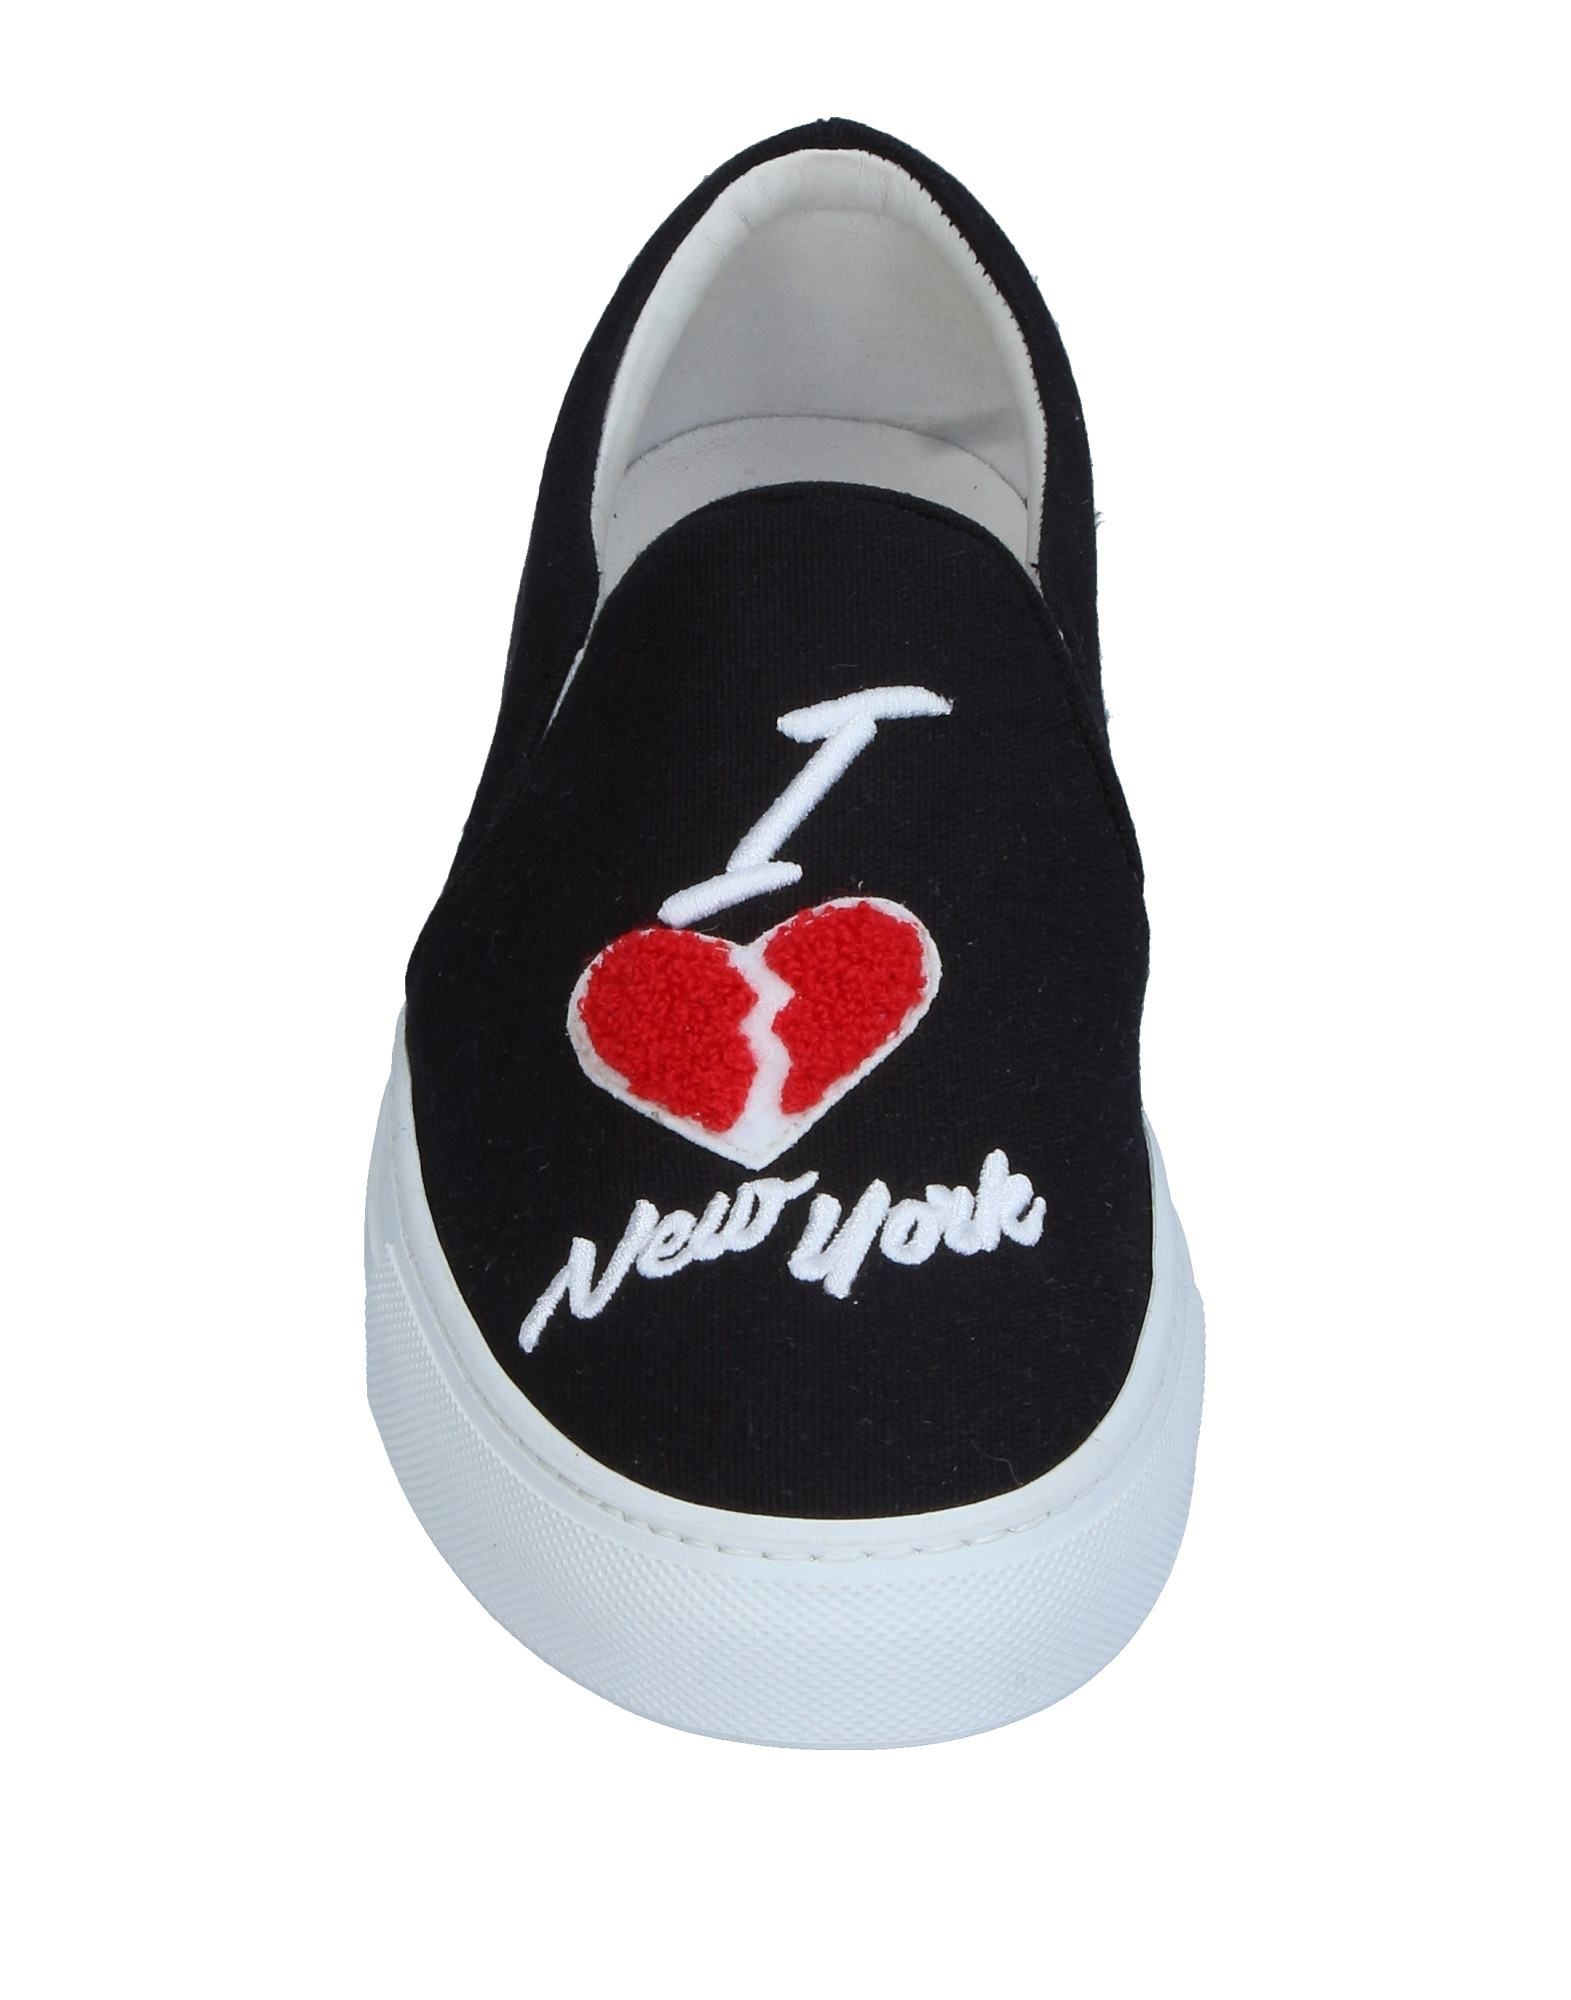 Joshua*S Sneakers Herren  11328847KK Heiße Schuhe Schuhe Heiße 755c53